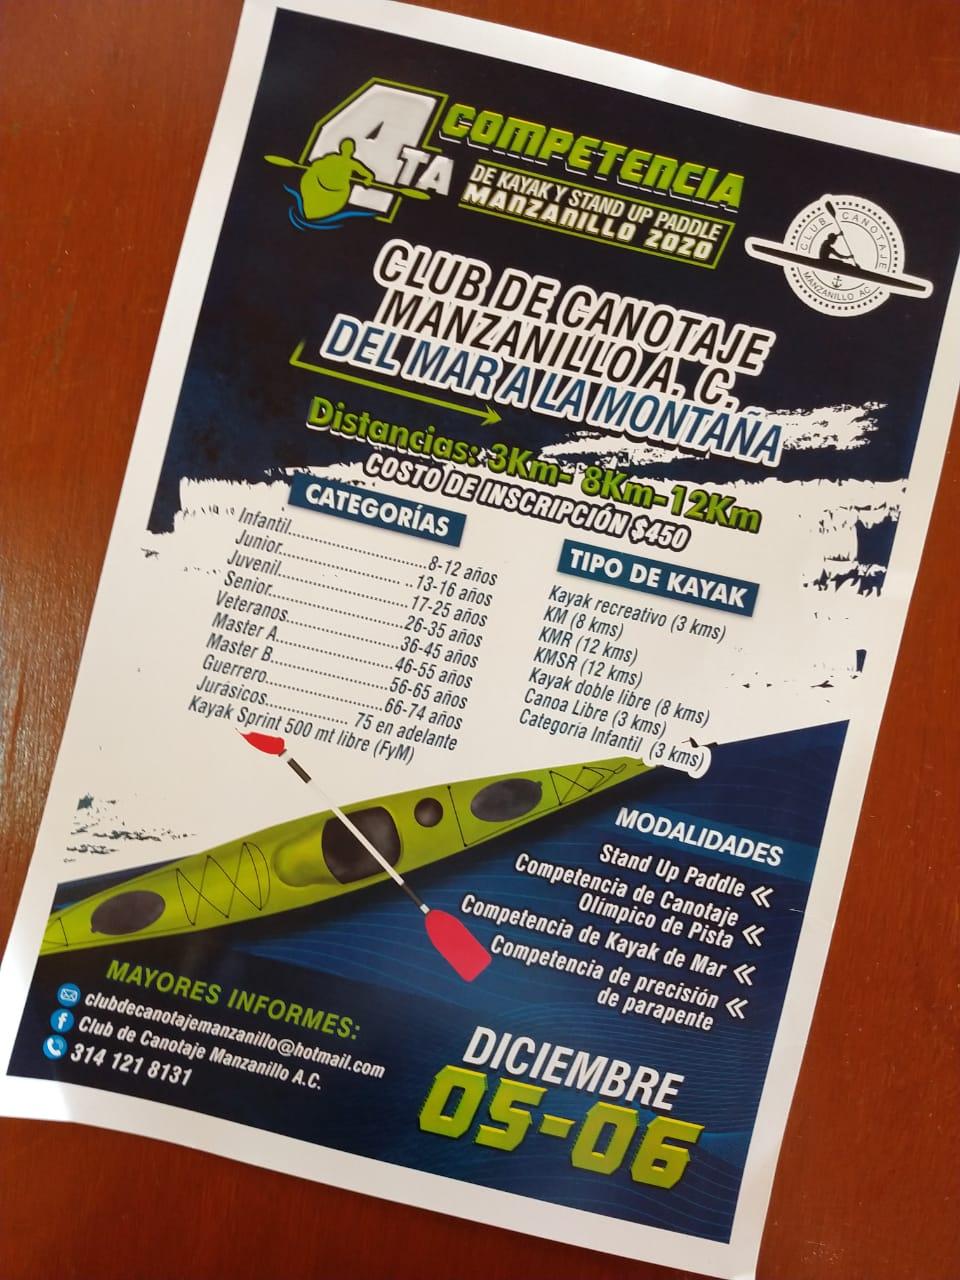 Club de Canotaje Manzanillo realizará 4ta competencia de Kayak 2020